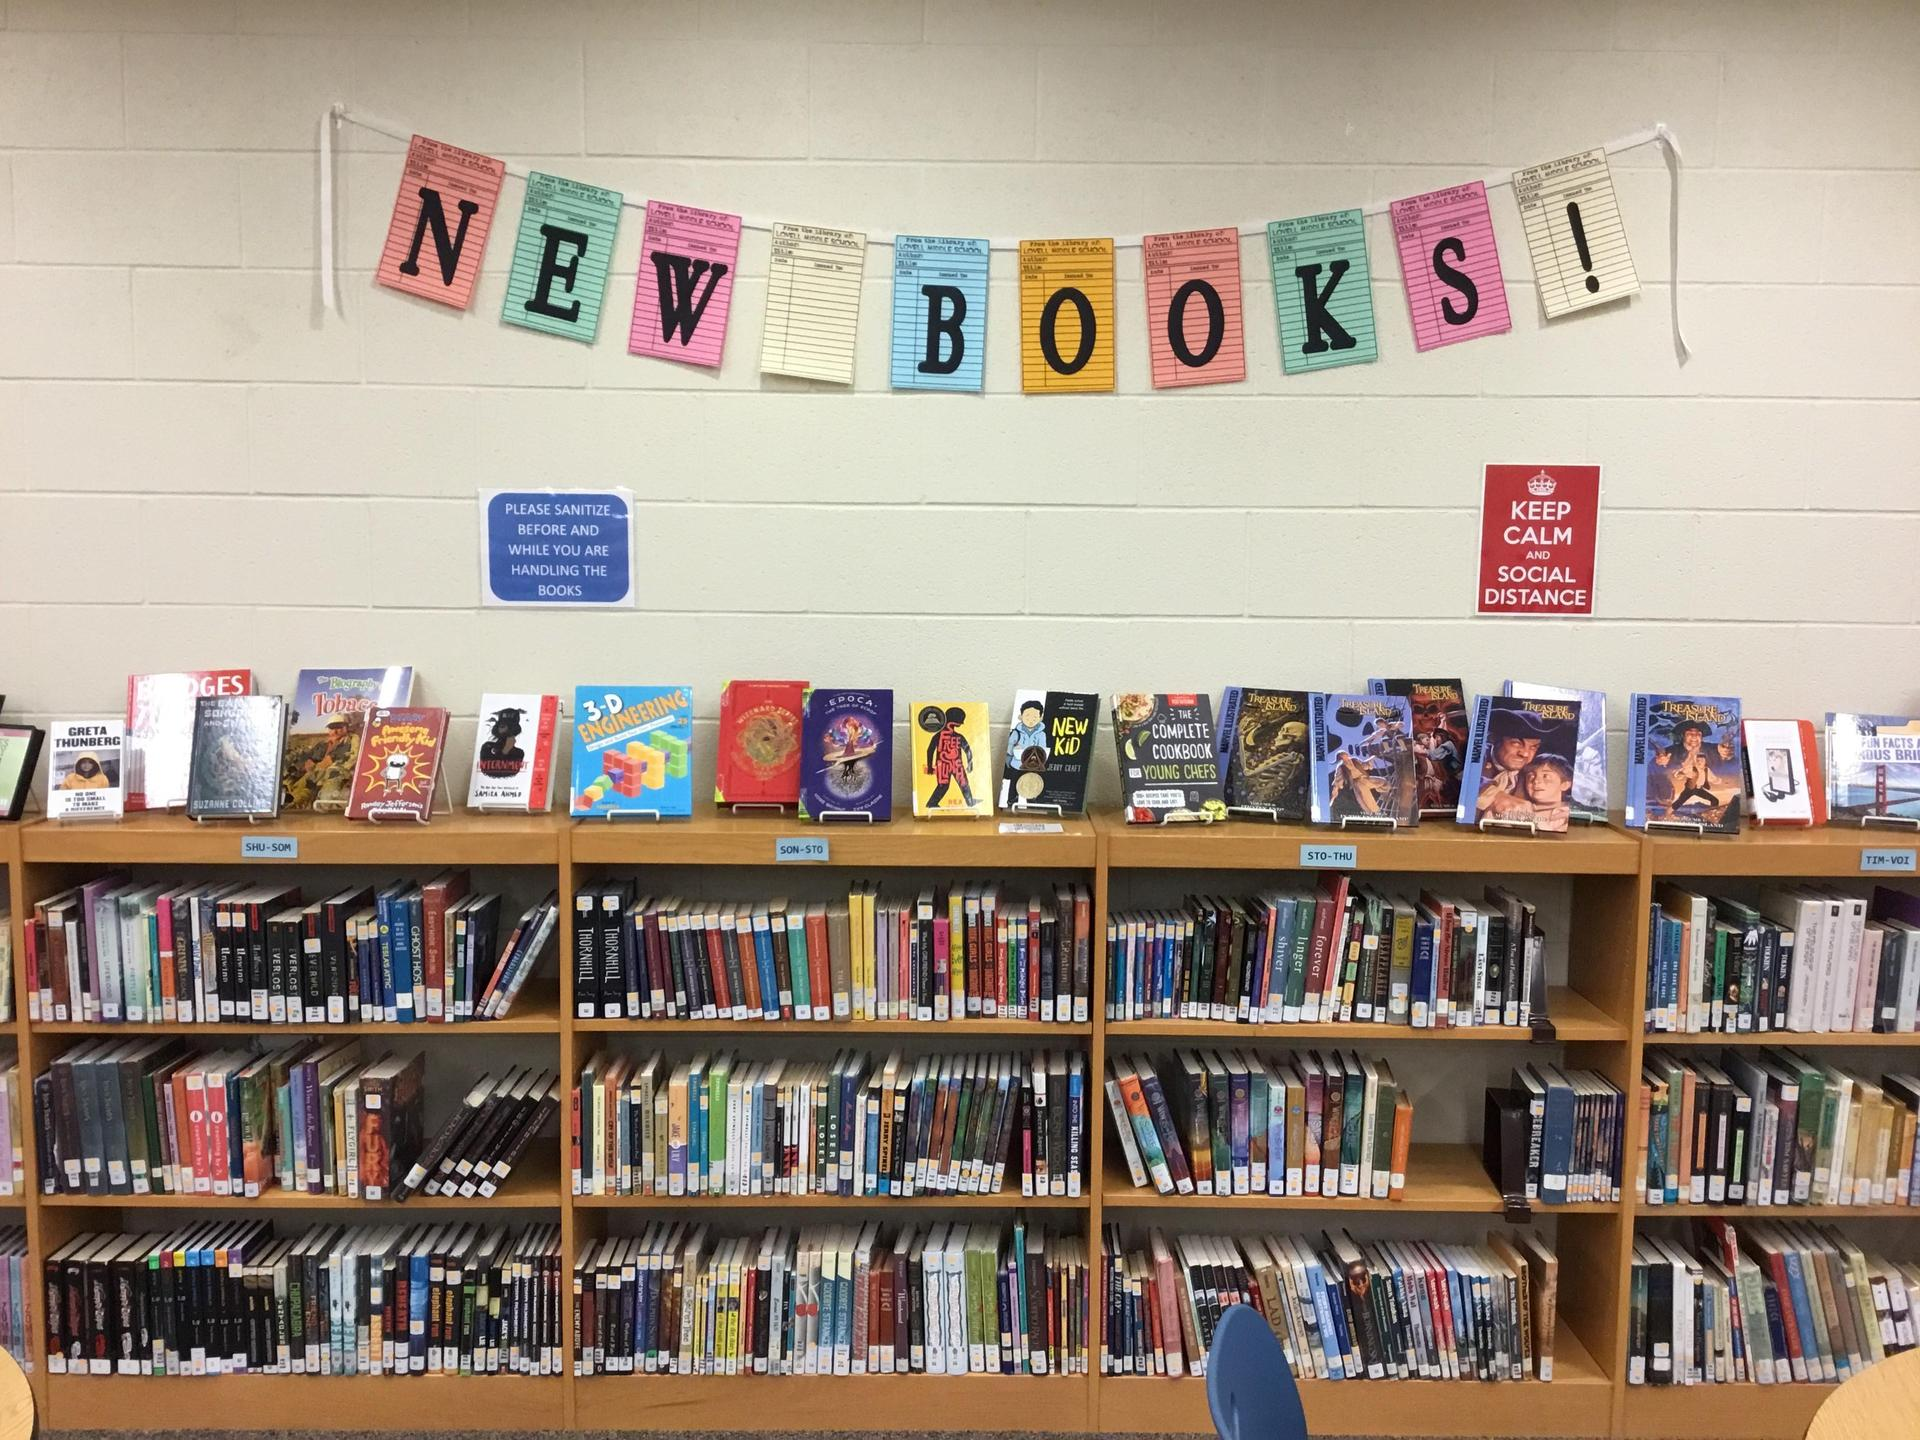 New book display